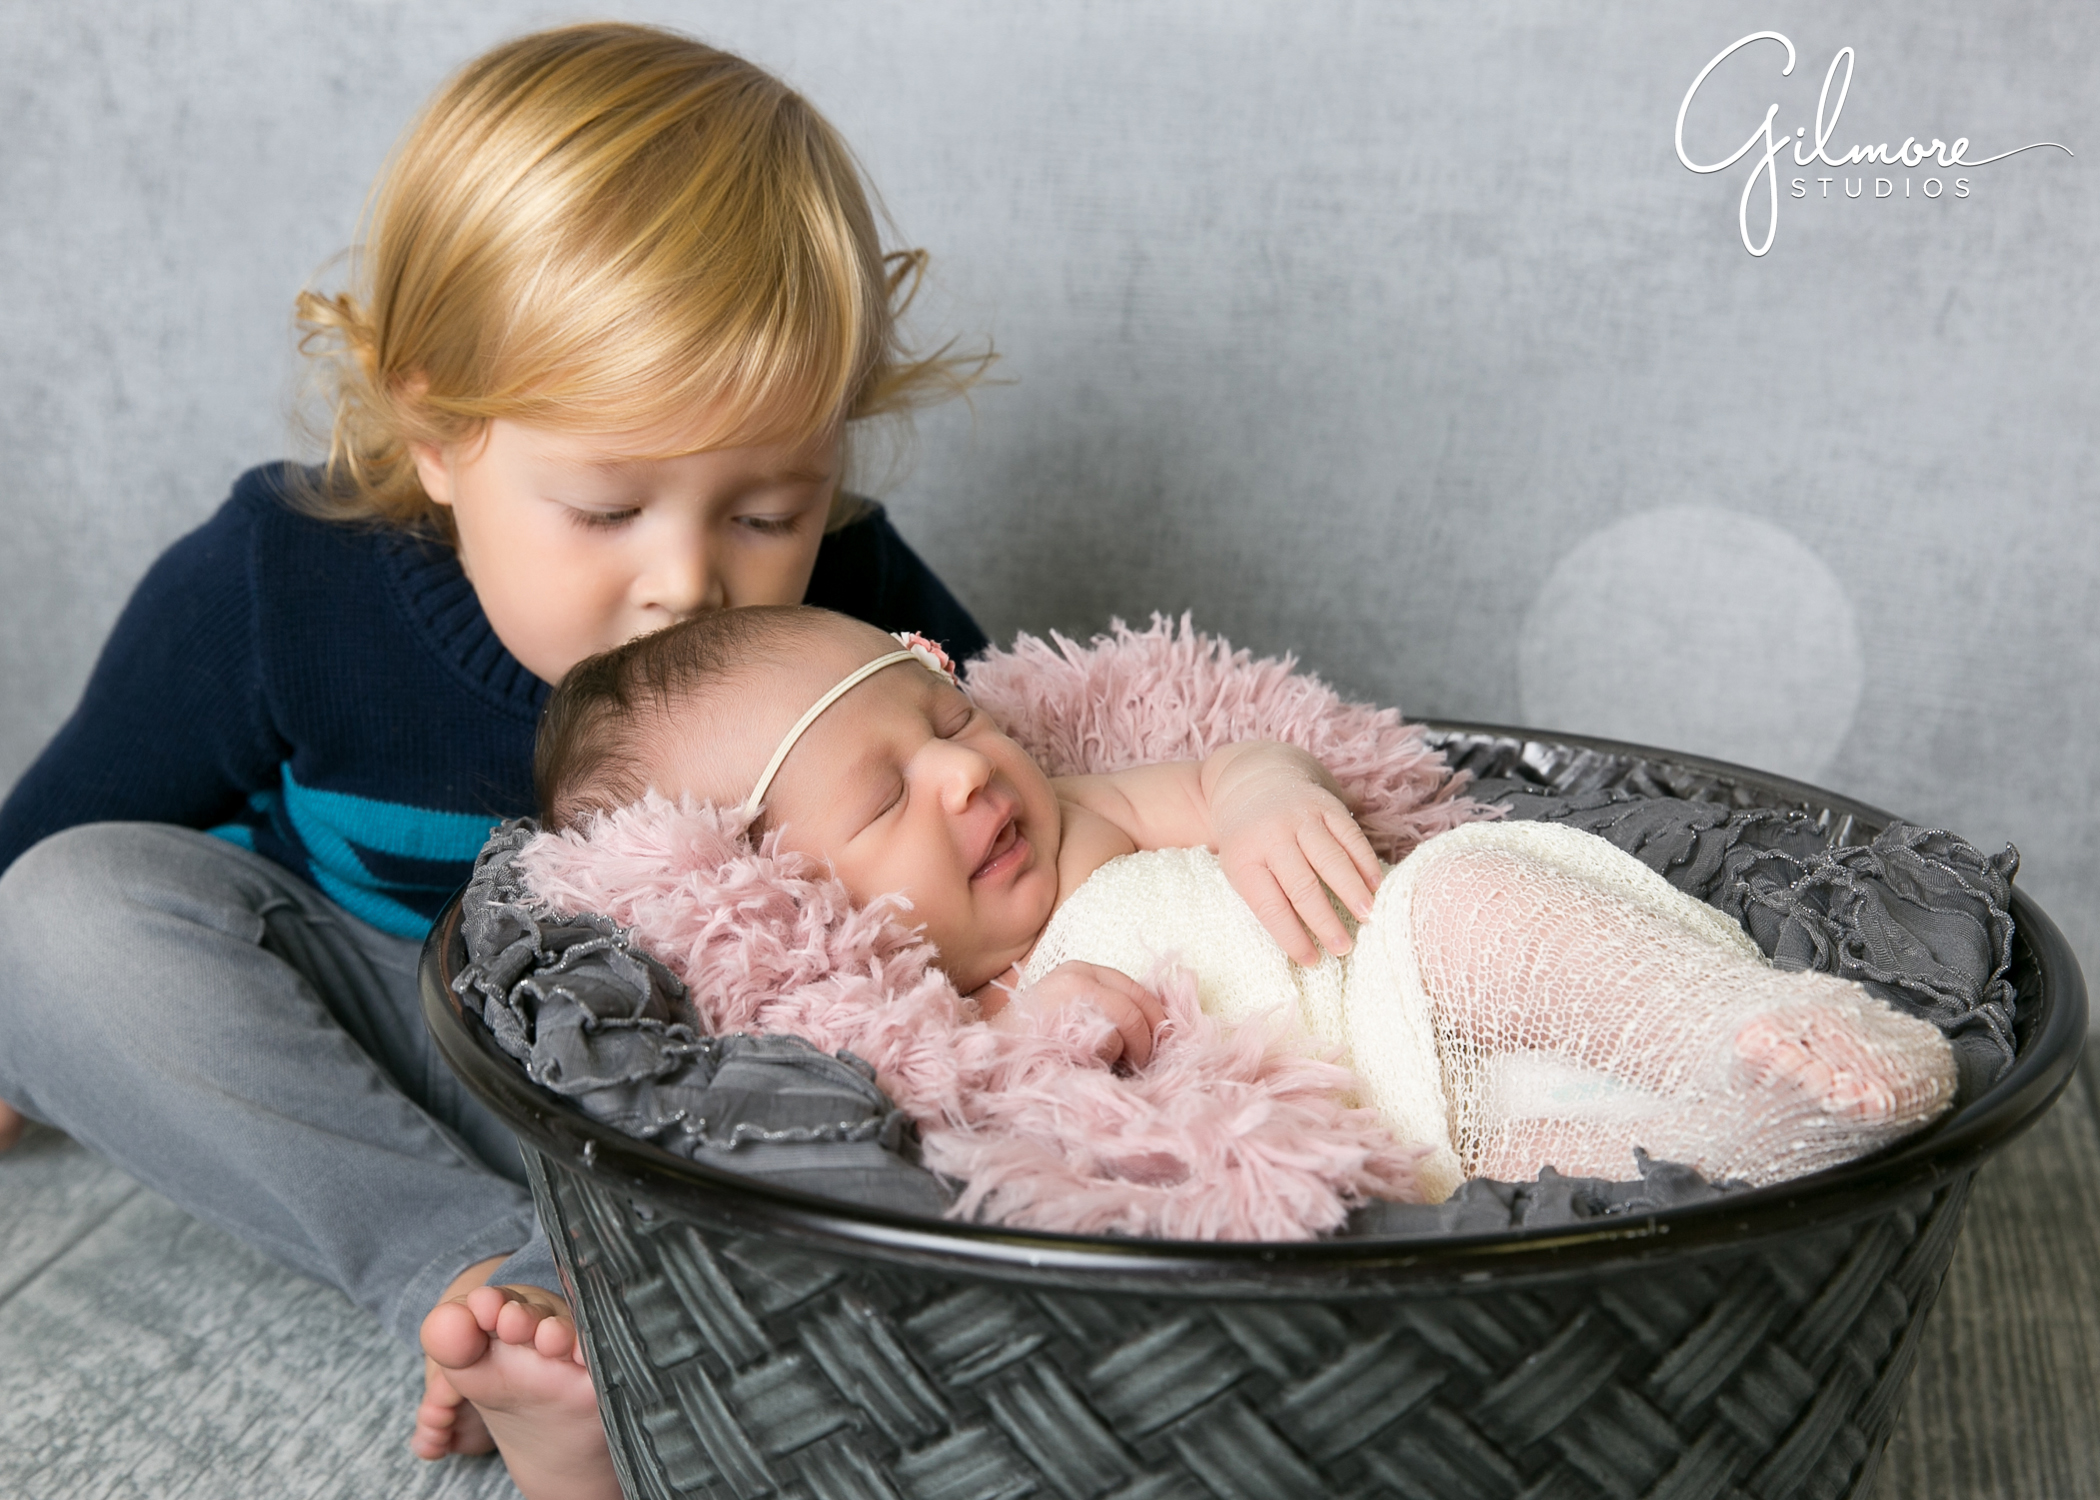 ae6d0c11f07 Costa-Mesa-Photography-Studio-Newborn-Baby-Girl-Family- ...